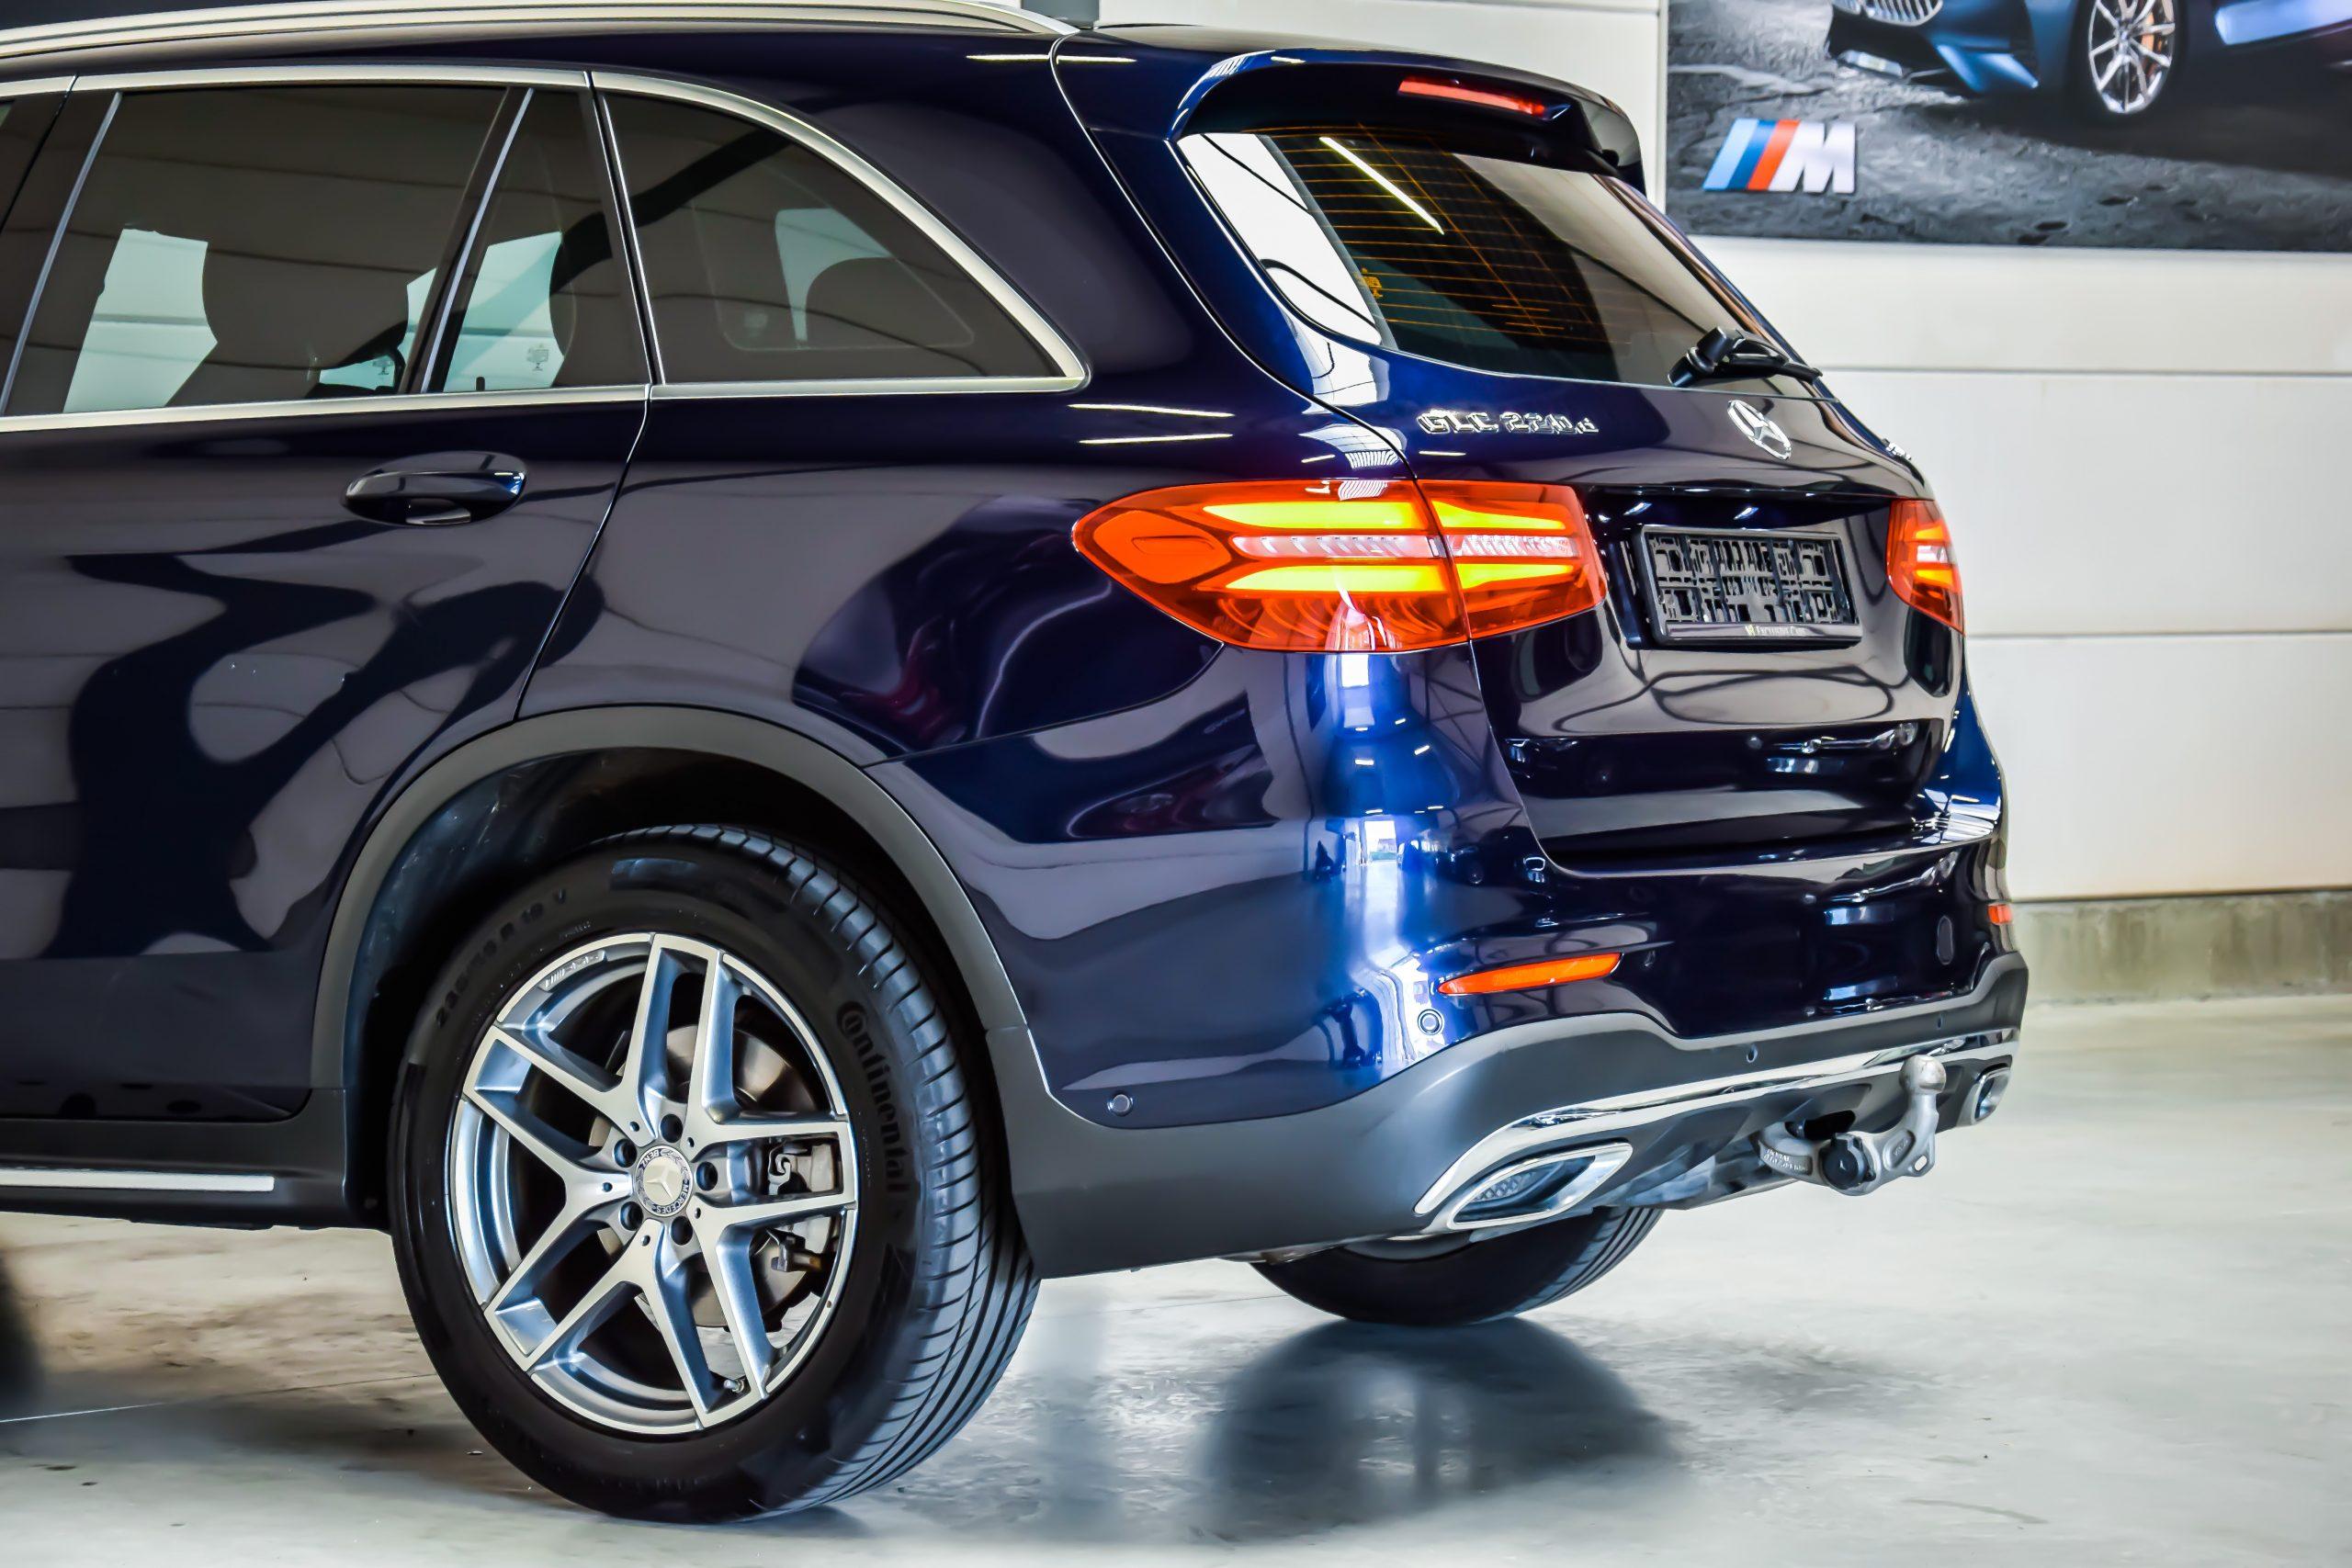 Mercedes-Benz GLC 220d Airmatic AMG-Line – Luchtveringen!!